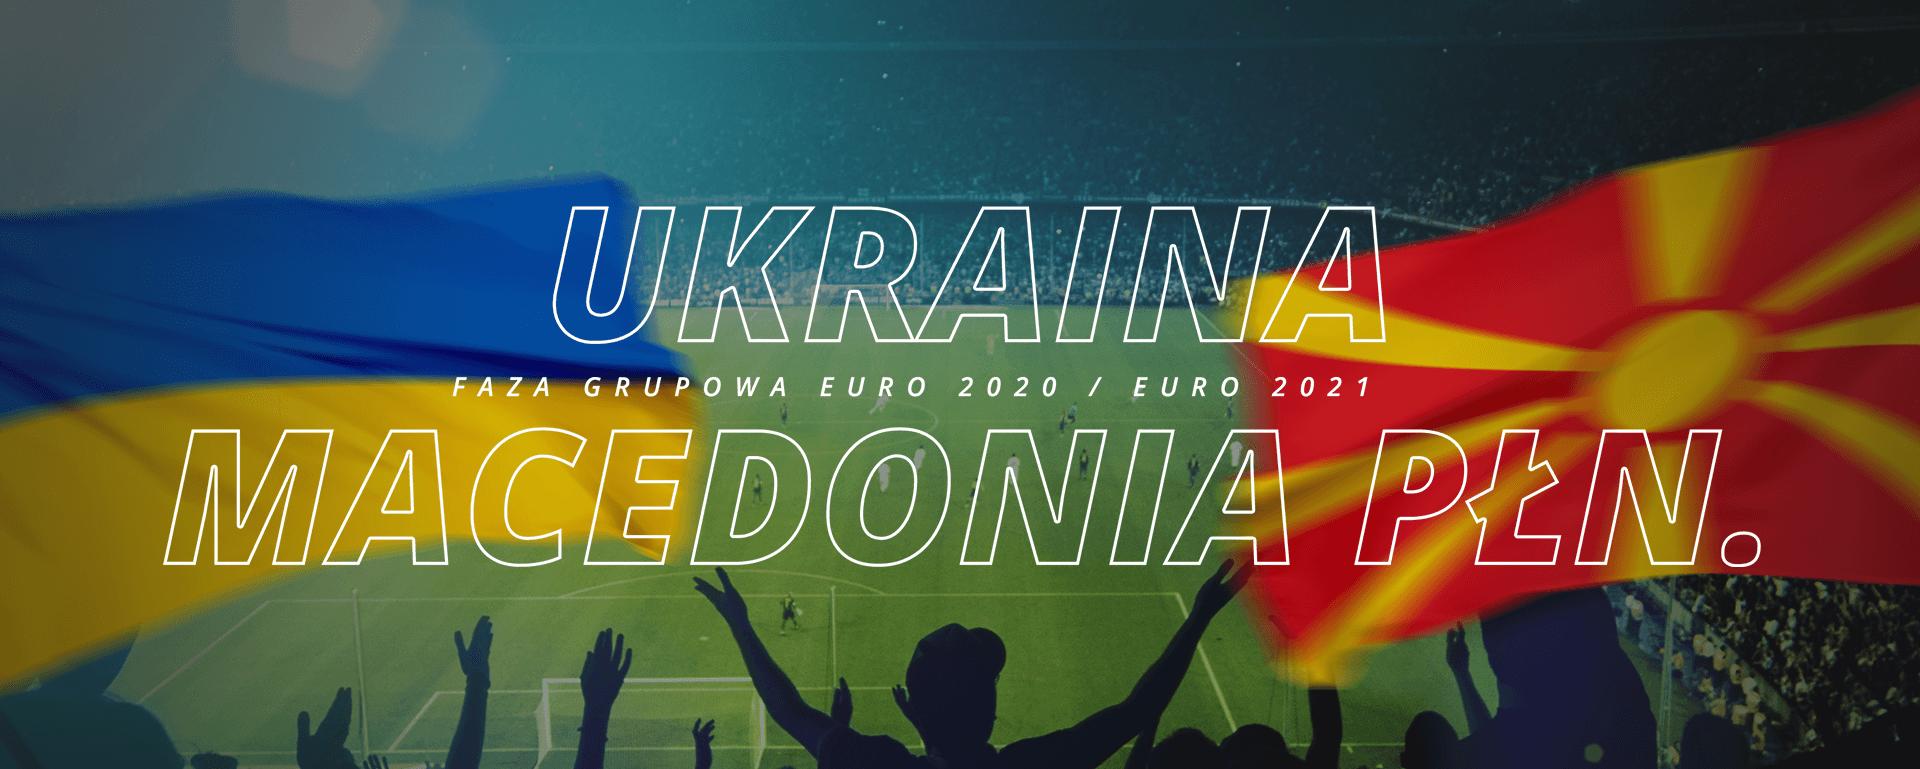 Ukraina – Macedonia Płn. | faza grupowa Euro 2020 / Euro 2021